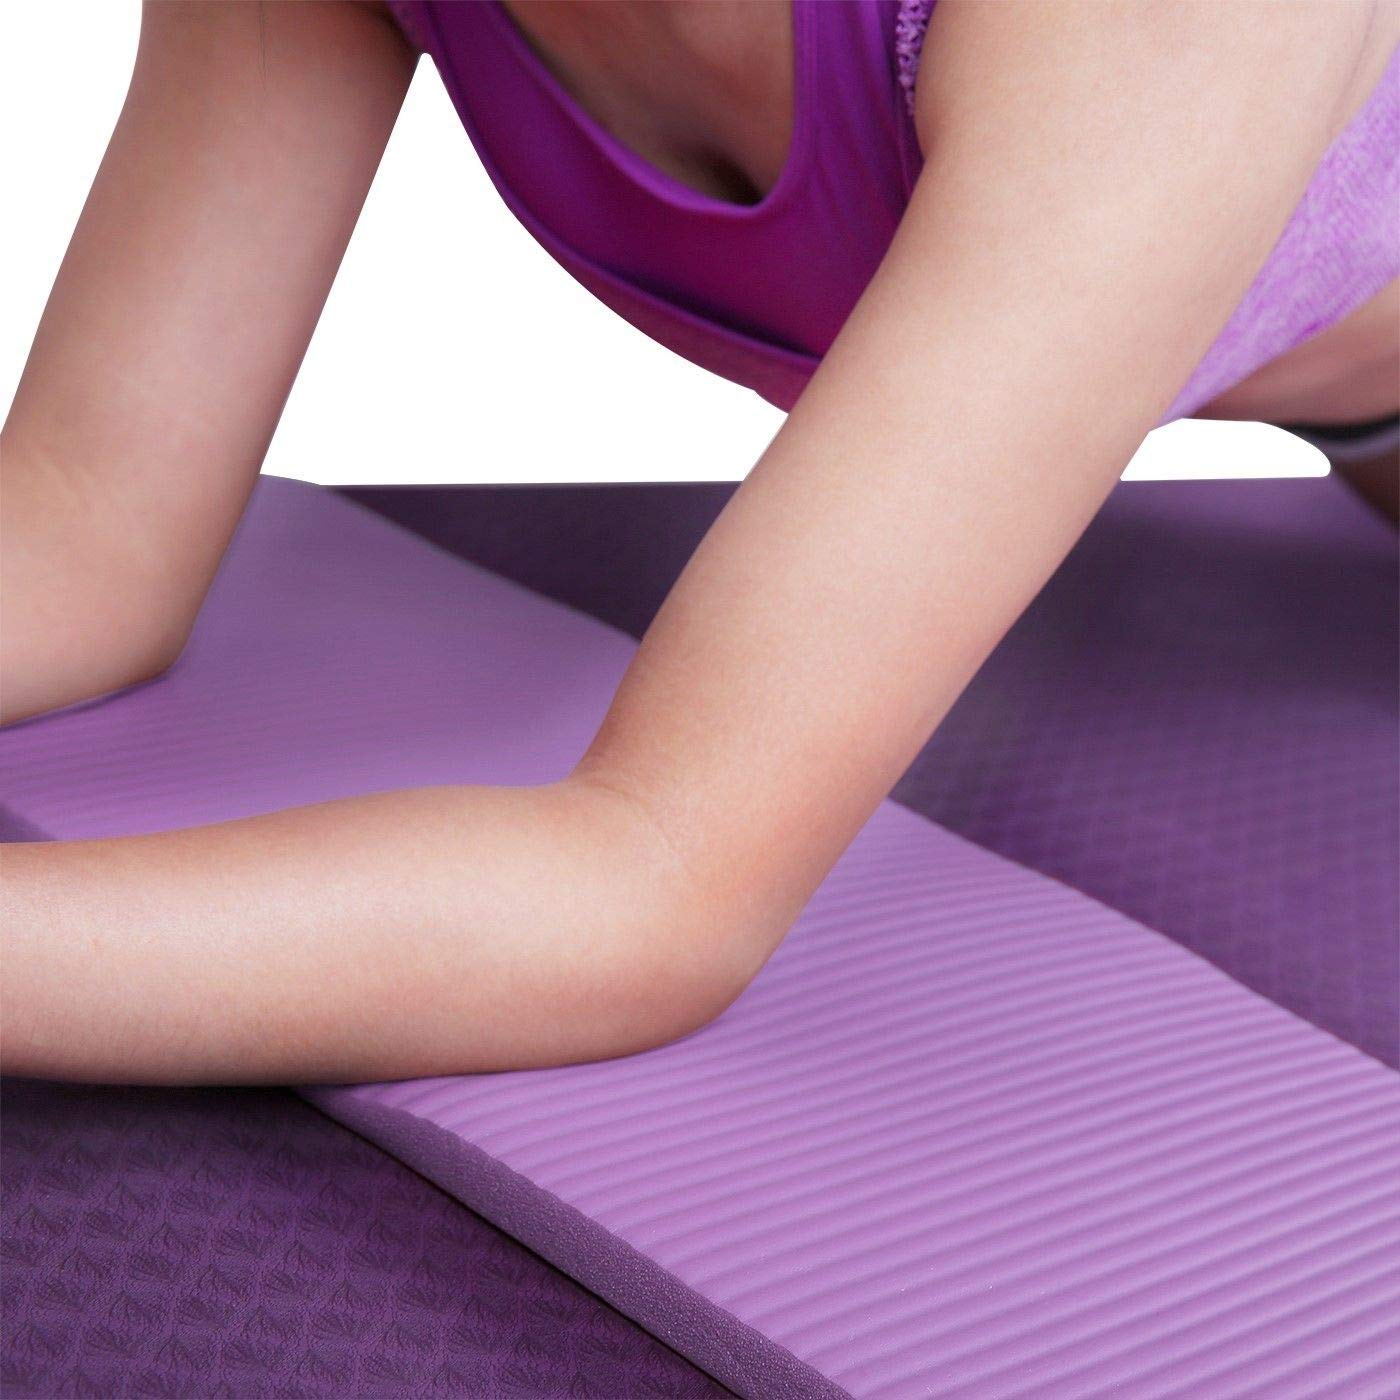 Amazon.com: 1 almohadilla de viaje para la rodilla de yoga ...